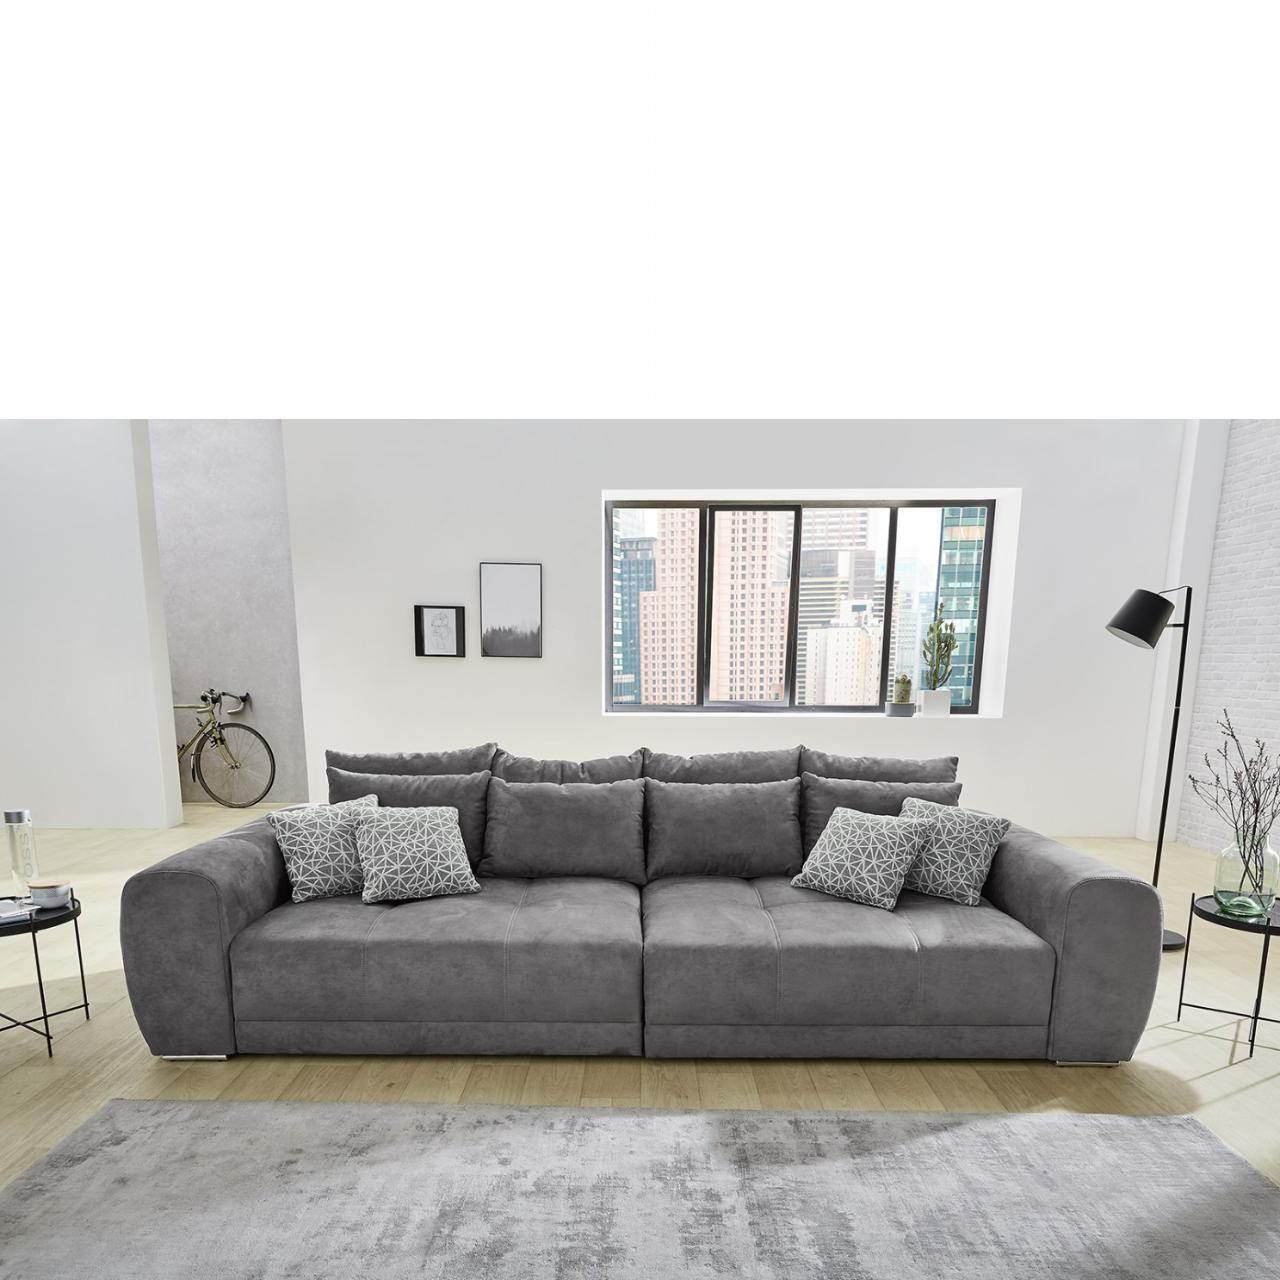 Big Sofa Moldau Stoff Grau Mega Sofa Lounge Riesensofa XXL Sofa Mit Kissen